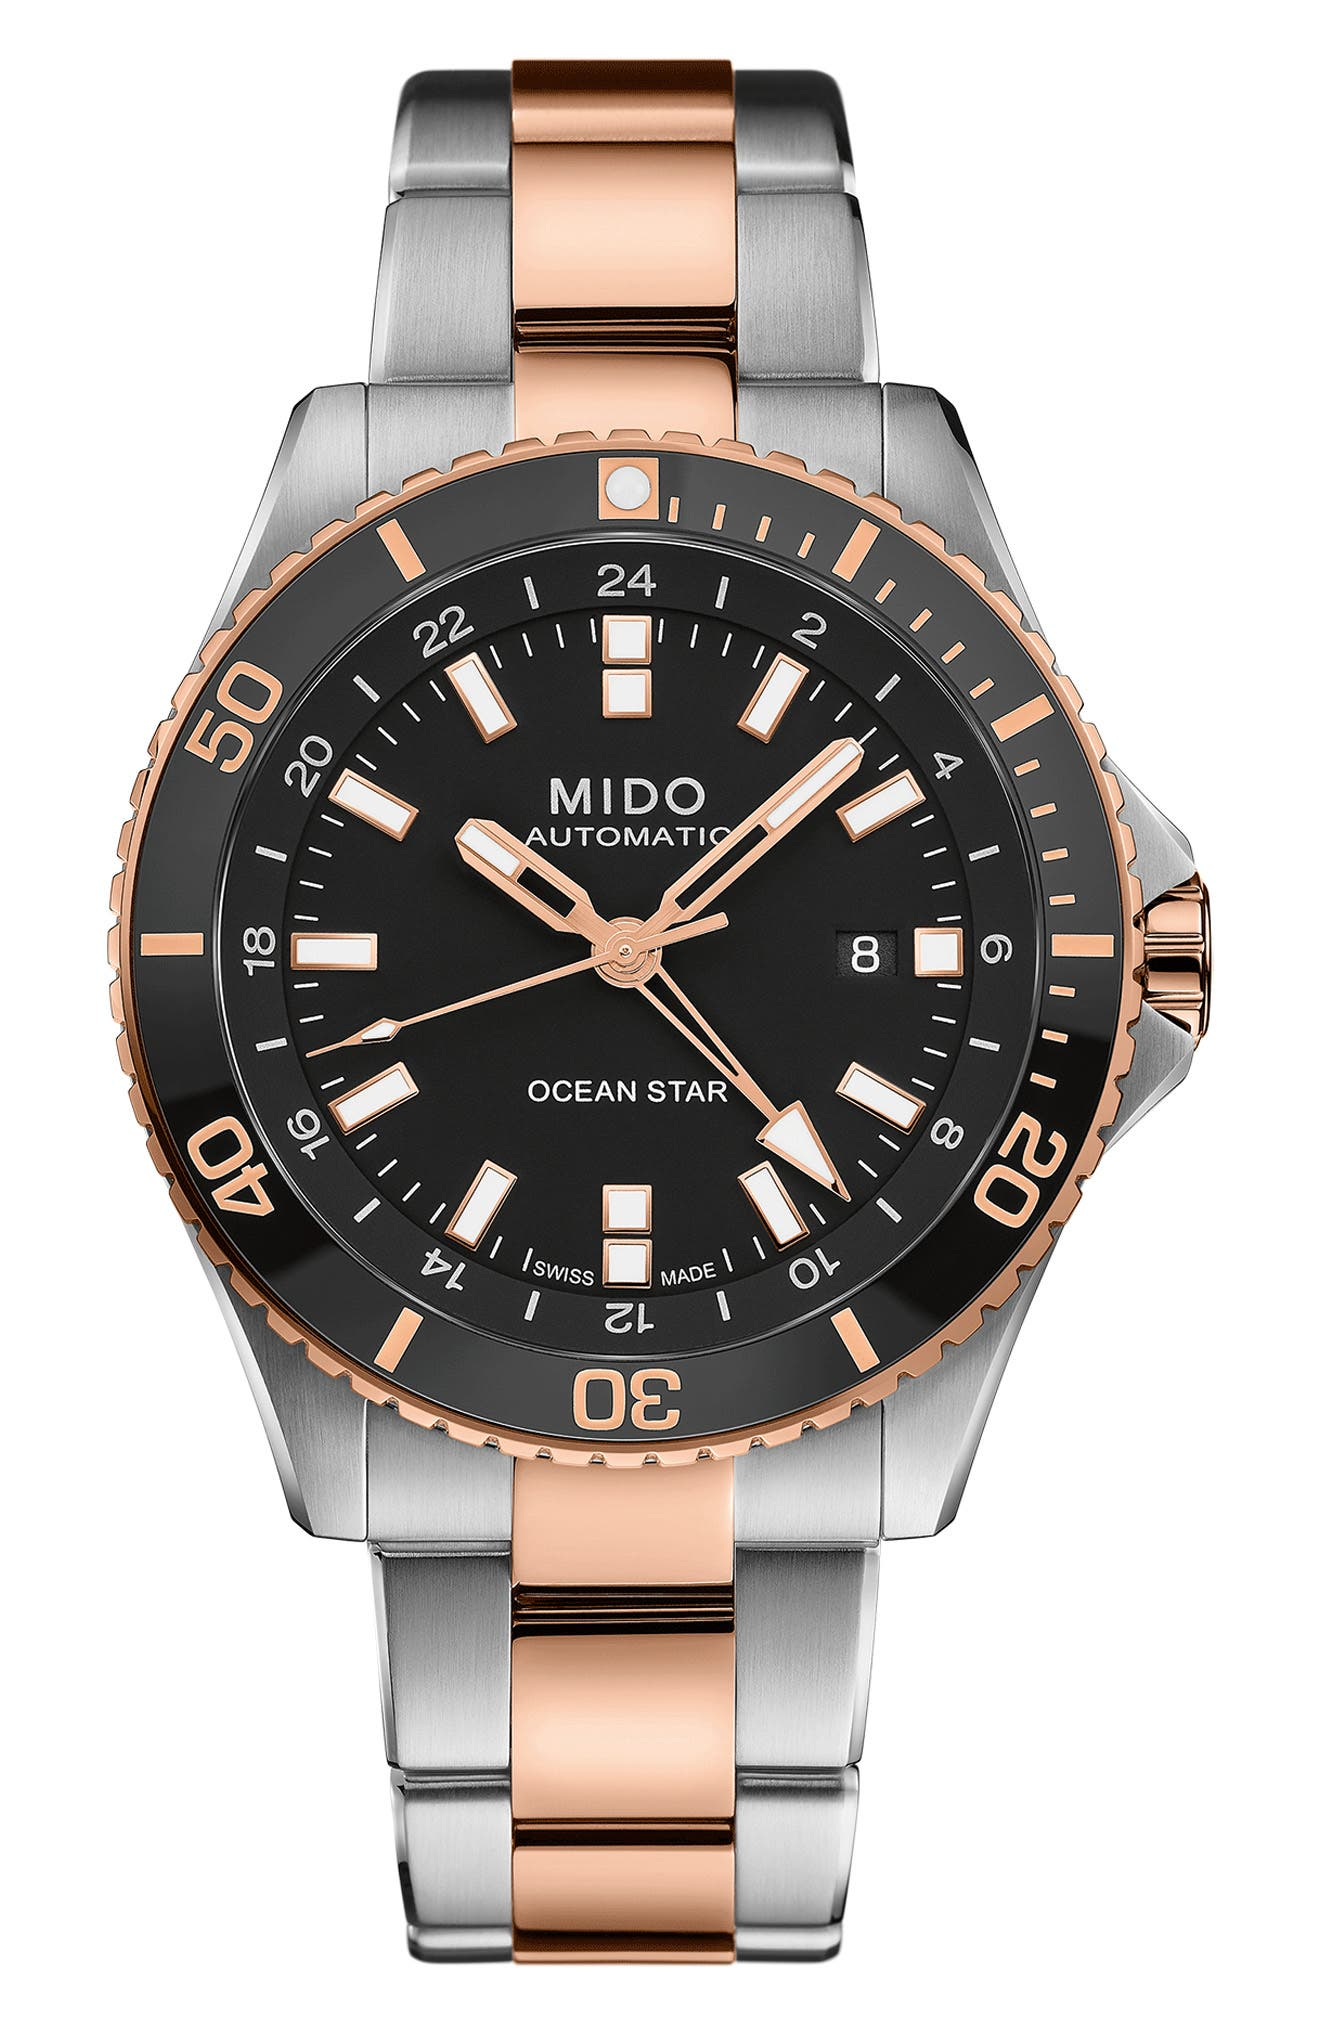 Ocean Star Gmt Automatic Bracelet Watch